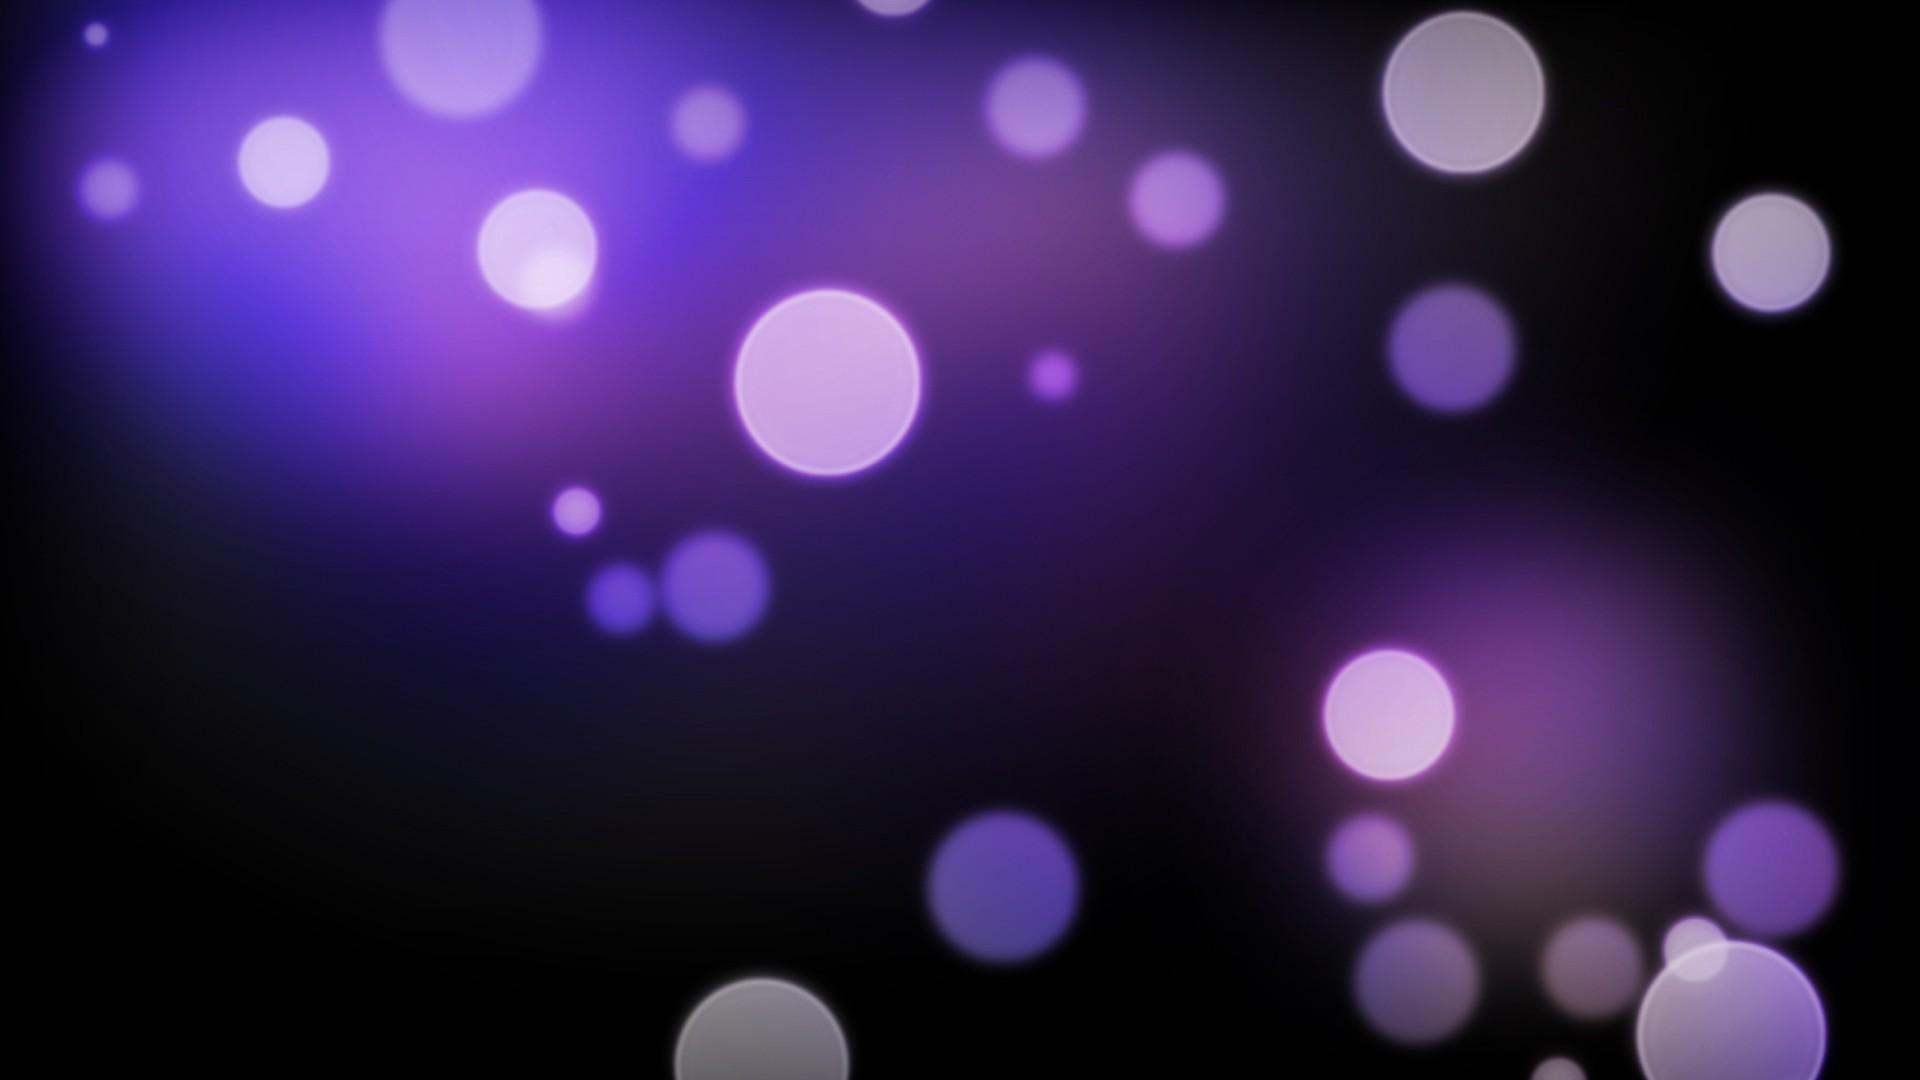 Purple background tumblr download free stunning full hd 1920x1080 purple lights wallpaper cute wallpaper share this cute wallpaper on voltagebd Gallery